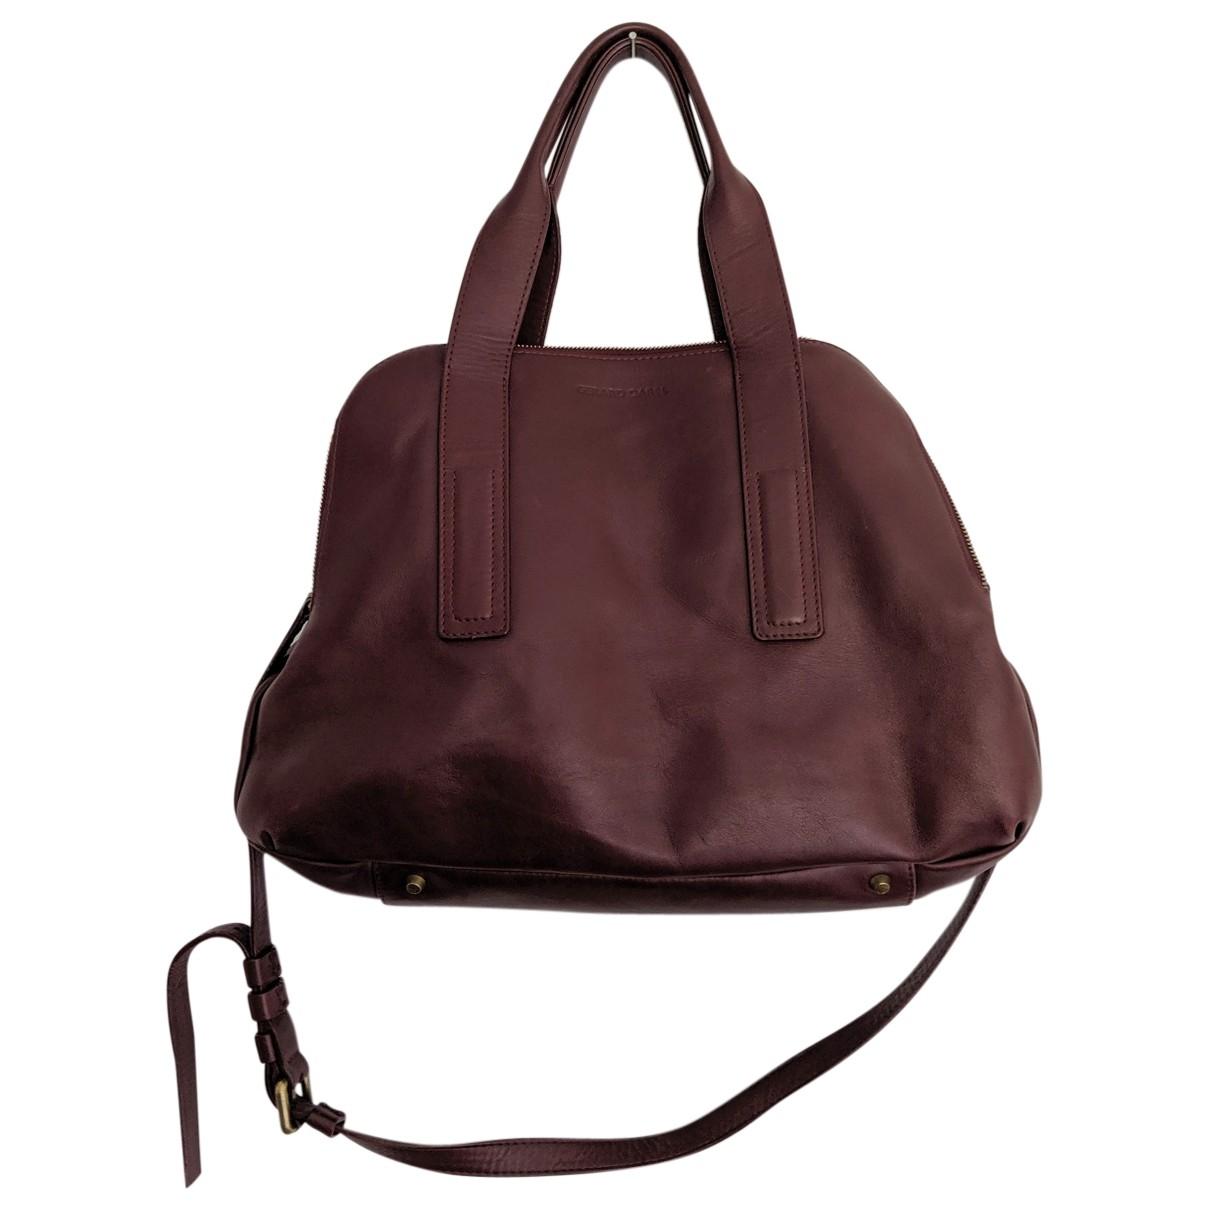 Gerard Darel \N Burgundy Leather handbag for Women \N